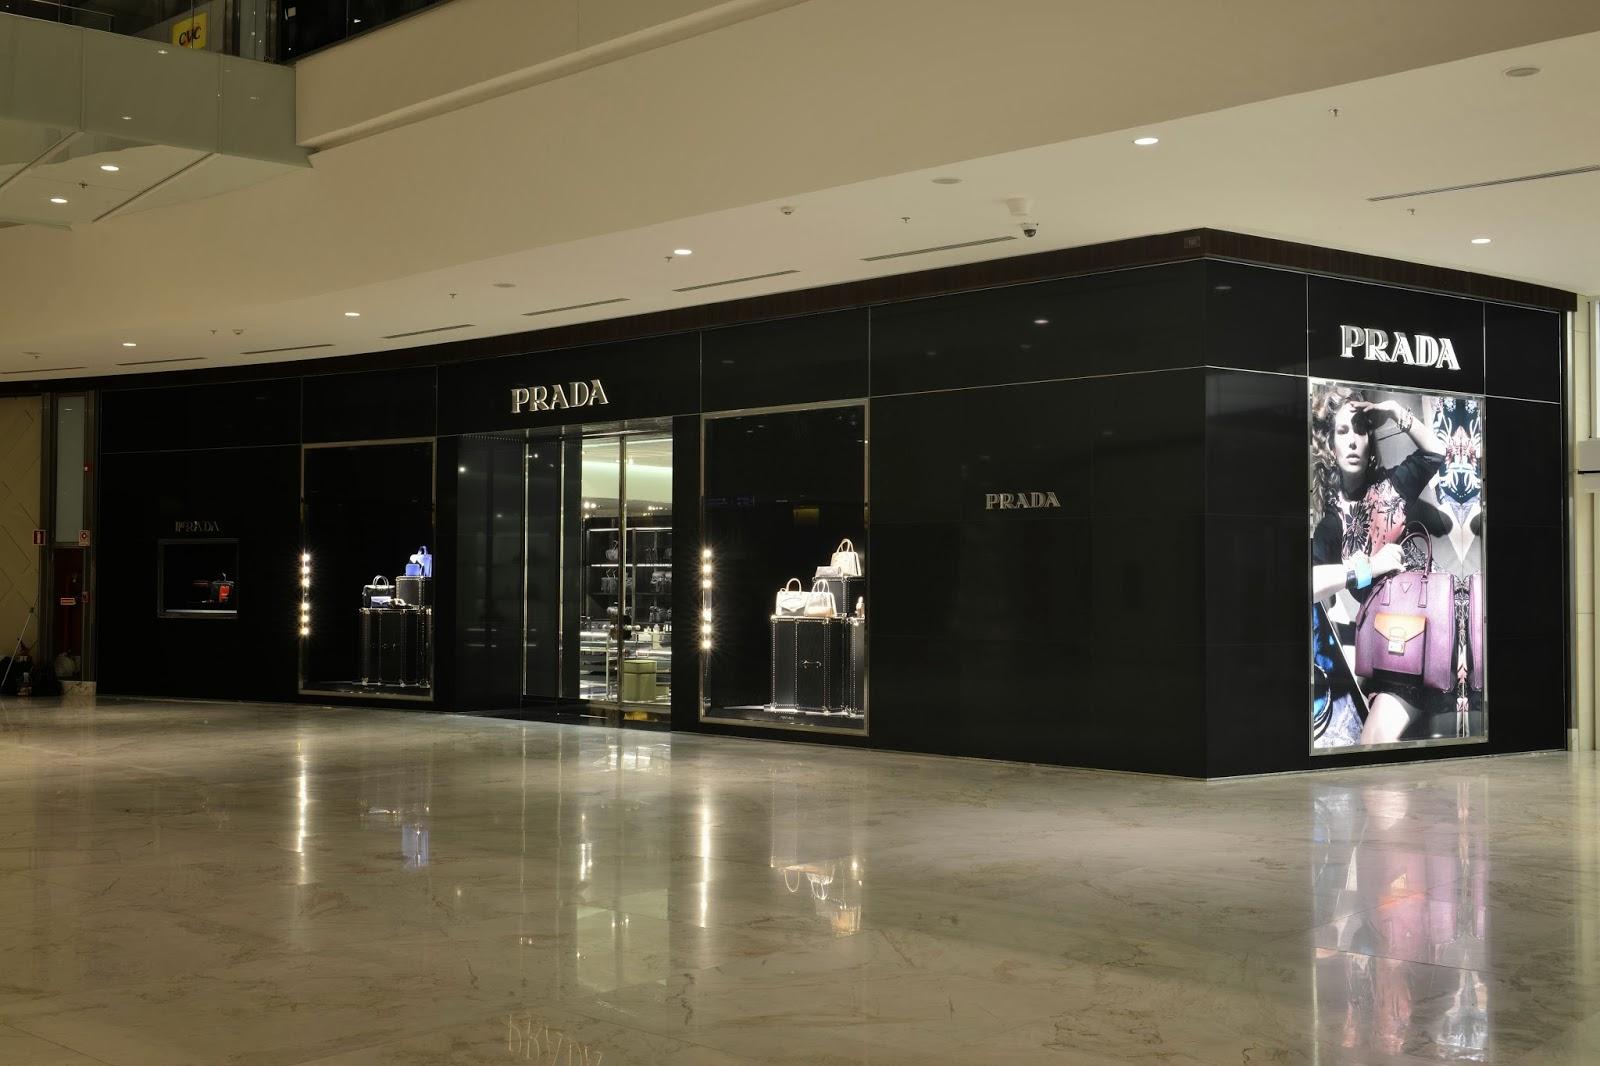 Prada reformulará fachada da loja de Curitiba c941ce0d22